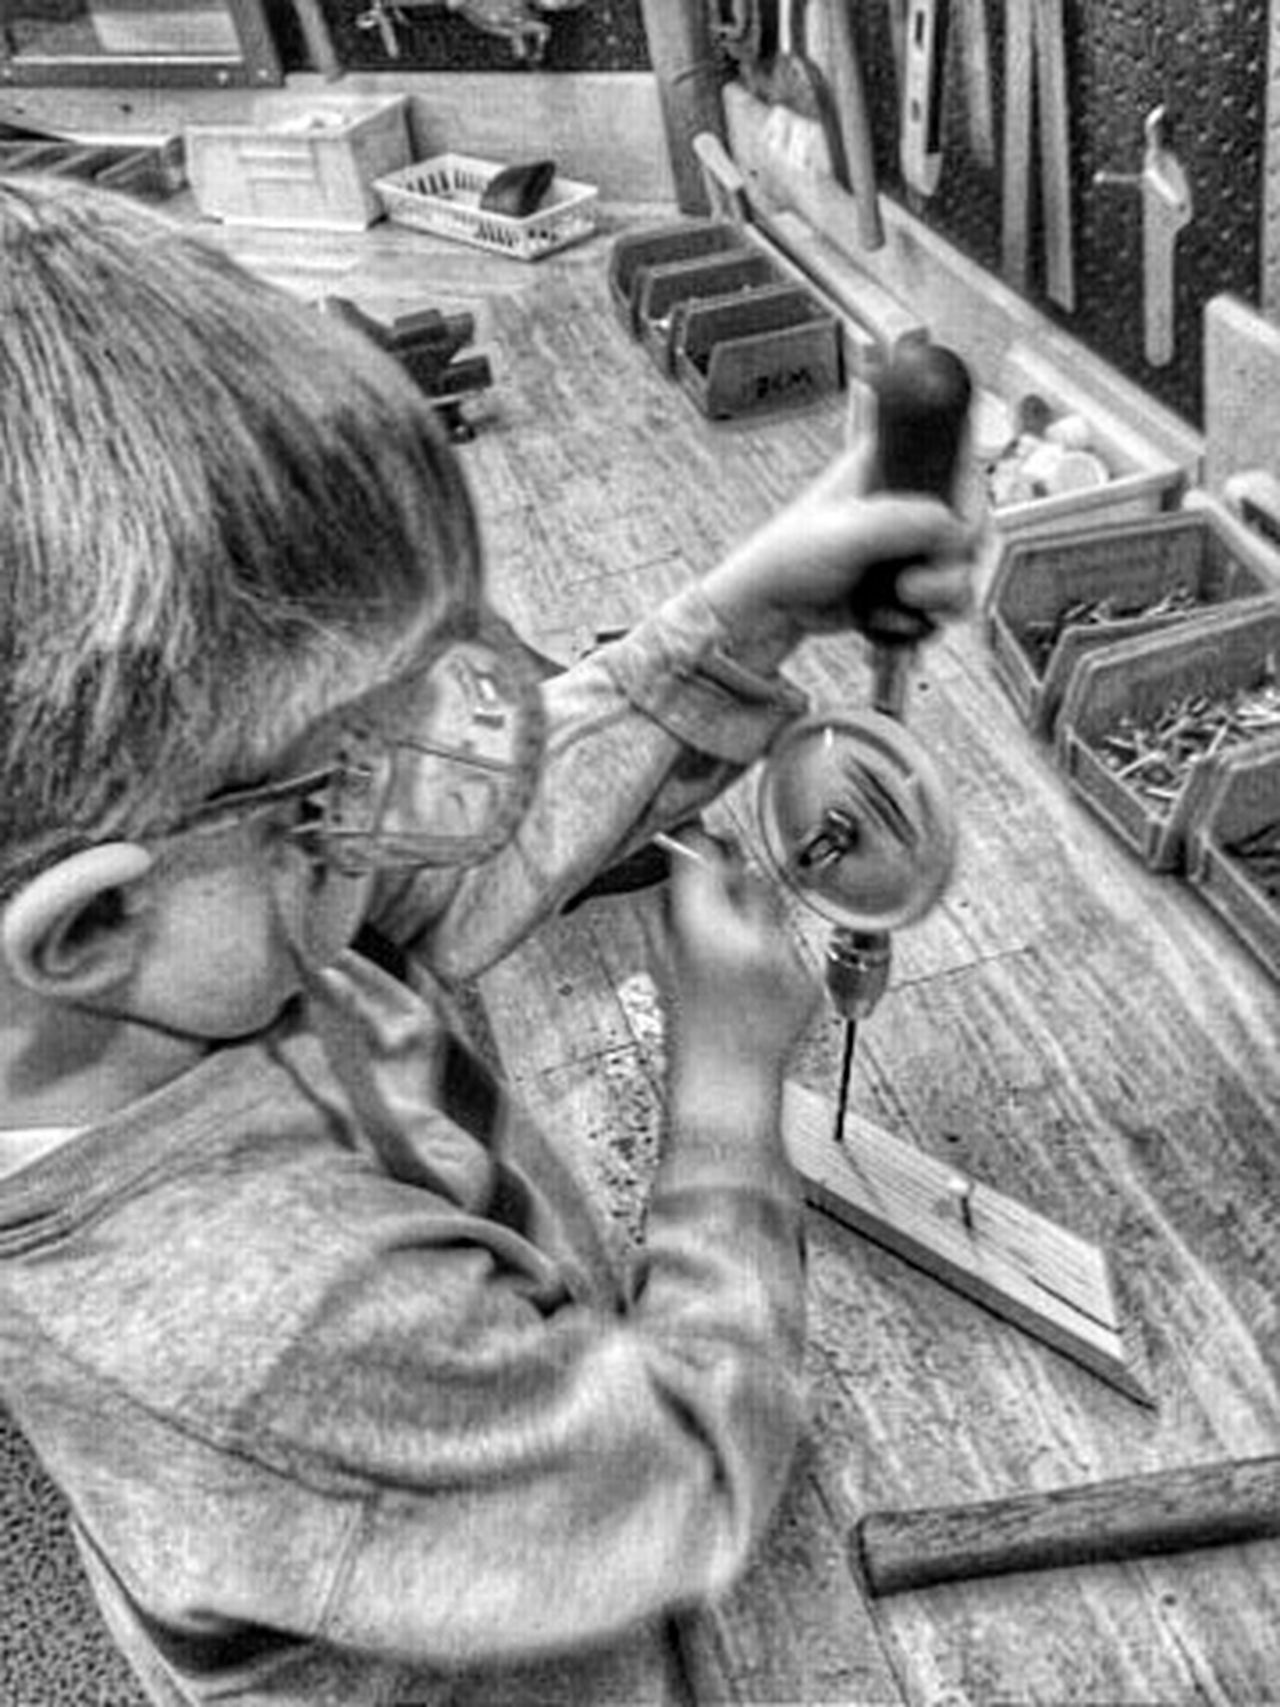 Boy learning wood working EyeEm Best Shots Eye4photography  Carpenter Learn School Wood - Material Wood Having Fun Children Children Photography Children's Portraits Childhood Memories Kids Playing Child Boy Childhood Black And White Black & White Black&white Blackandwhite Shop Class Carpentry Playing